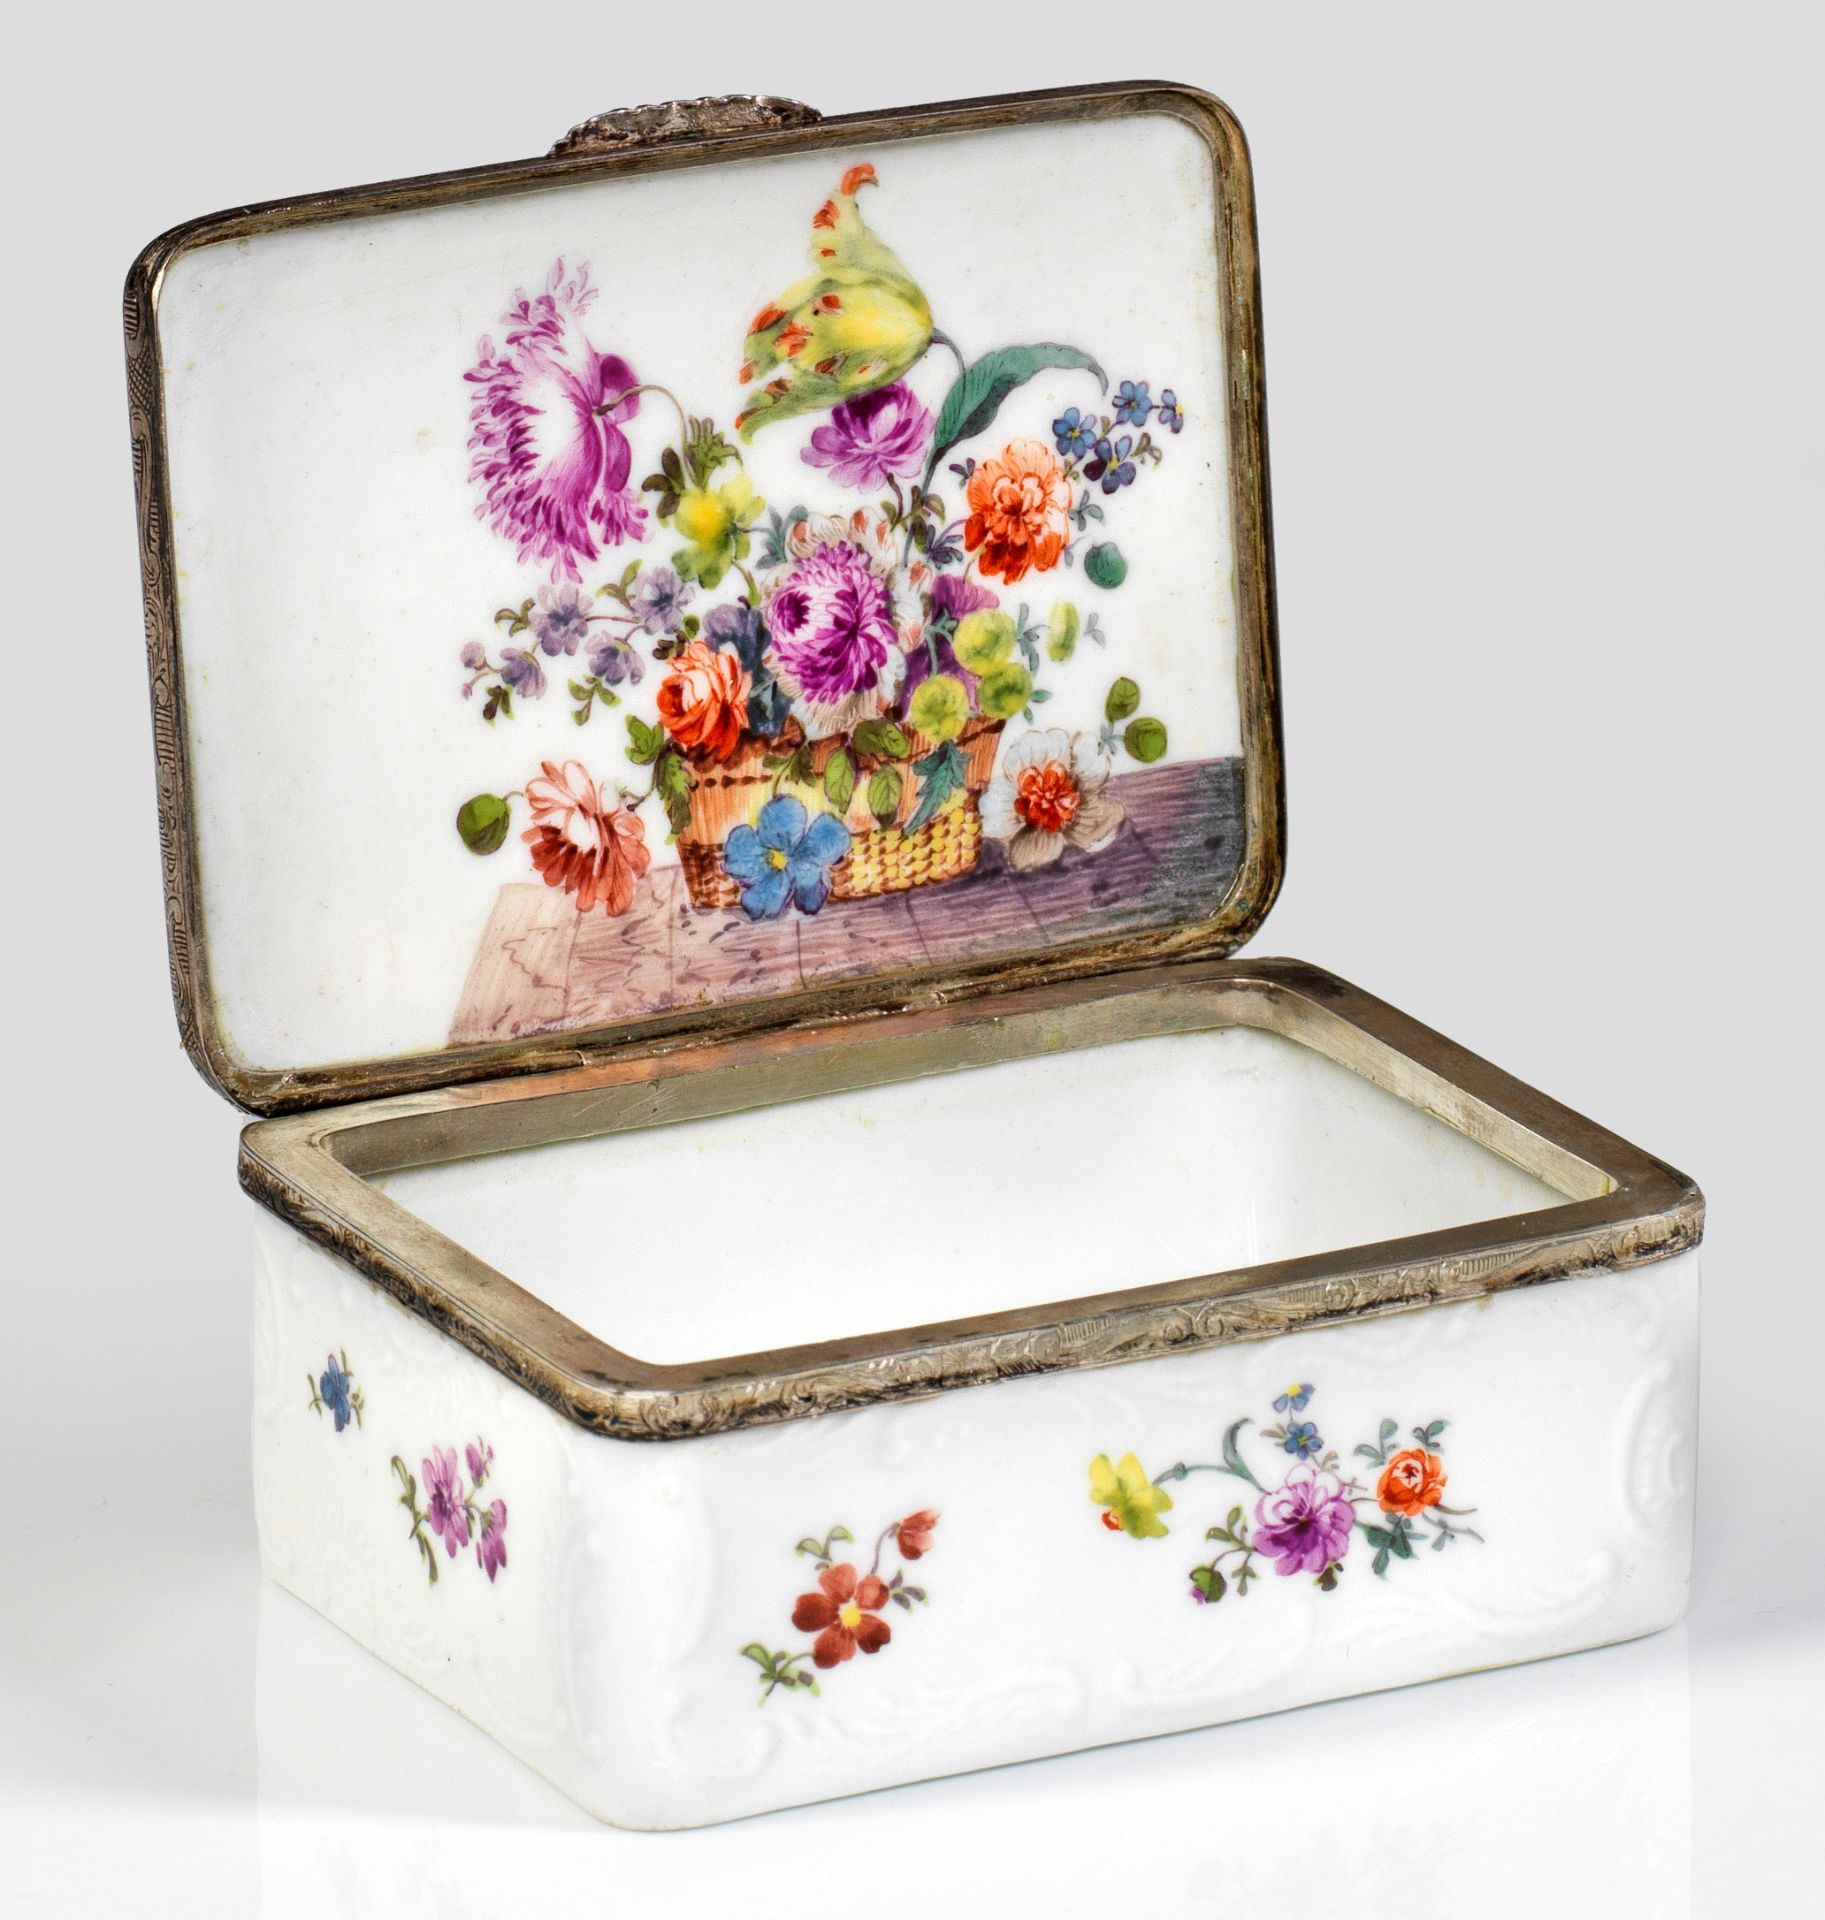 Tabatiere mit Blumendekor